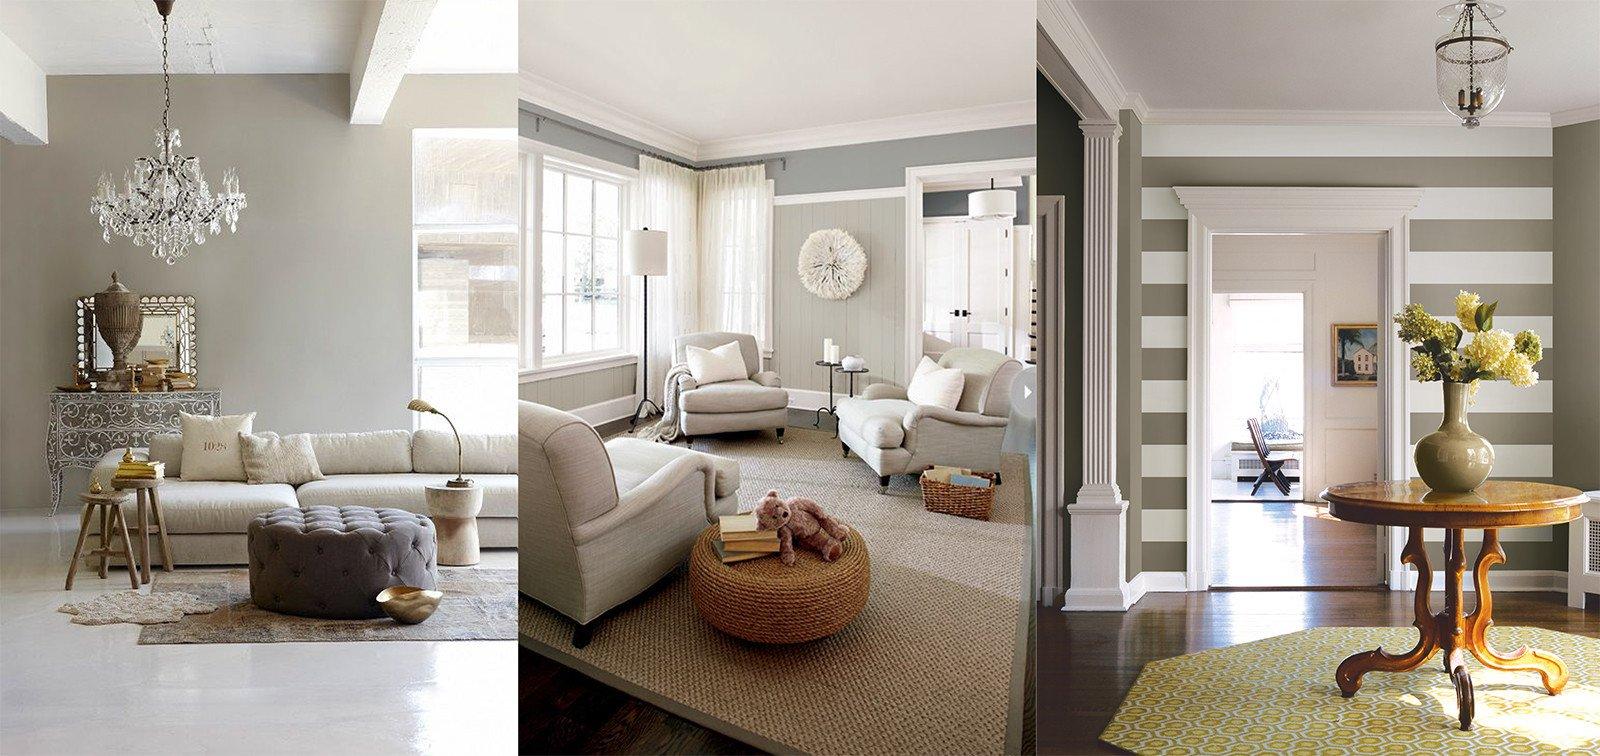 New Trends In Home Decor Elegant Best 25 Interior Decorating Colors 2018 Interior Decorating Colors Interior Decorating Colors